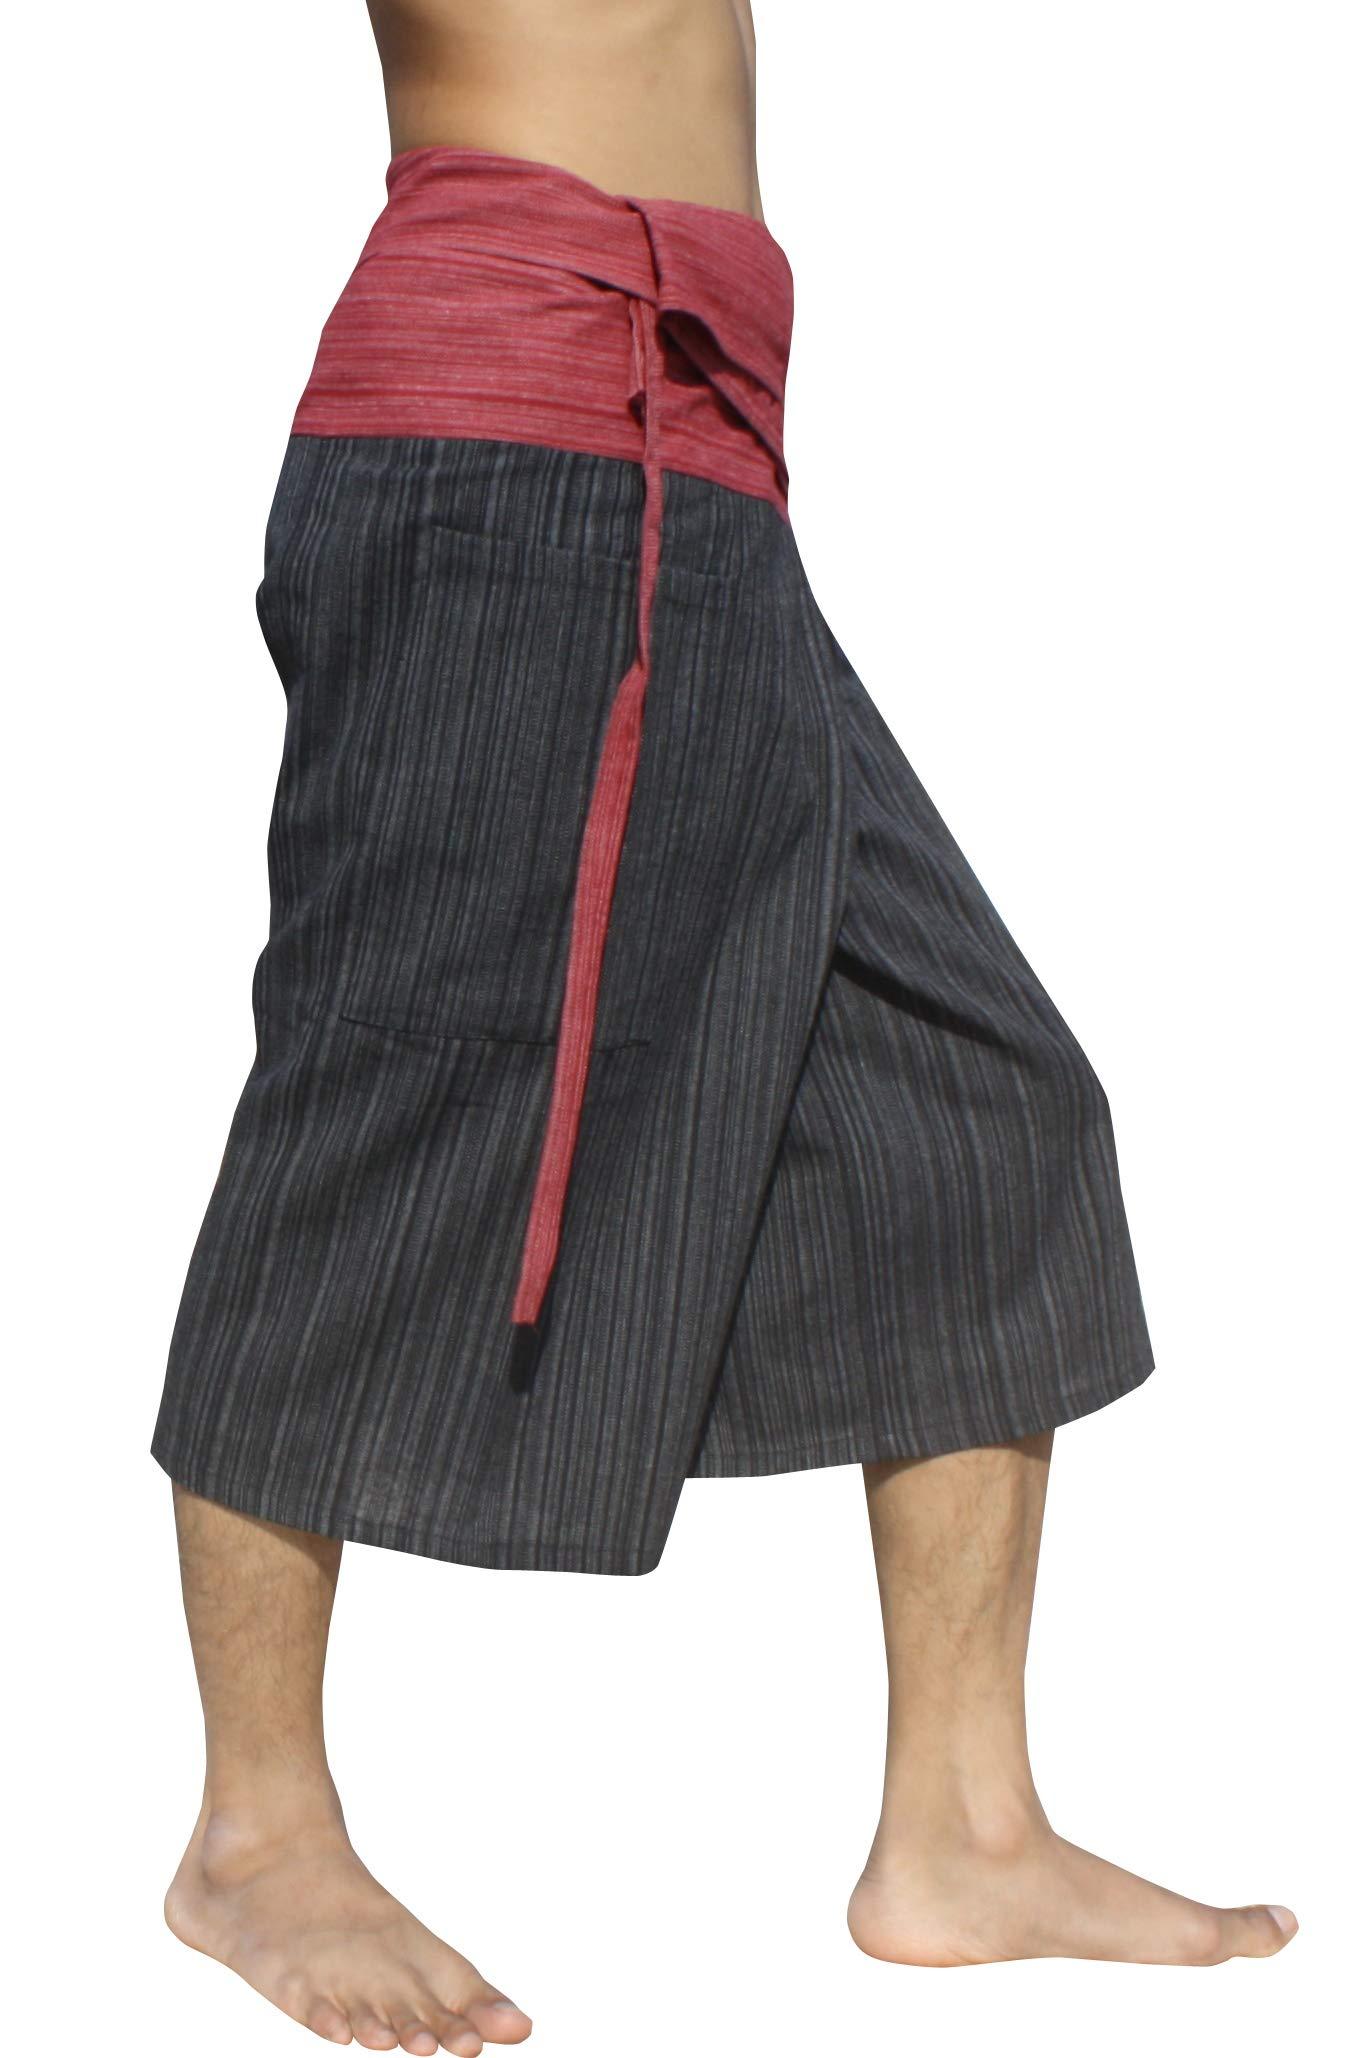 Raan Pah Muang Thin Striped Cotton Two Tone Fisherman Capri Wrap Plus Sized Pants, XX-Large, Burgundy Red/Black by Raan Pah Muang